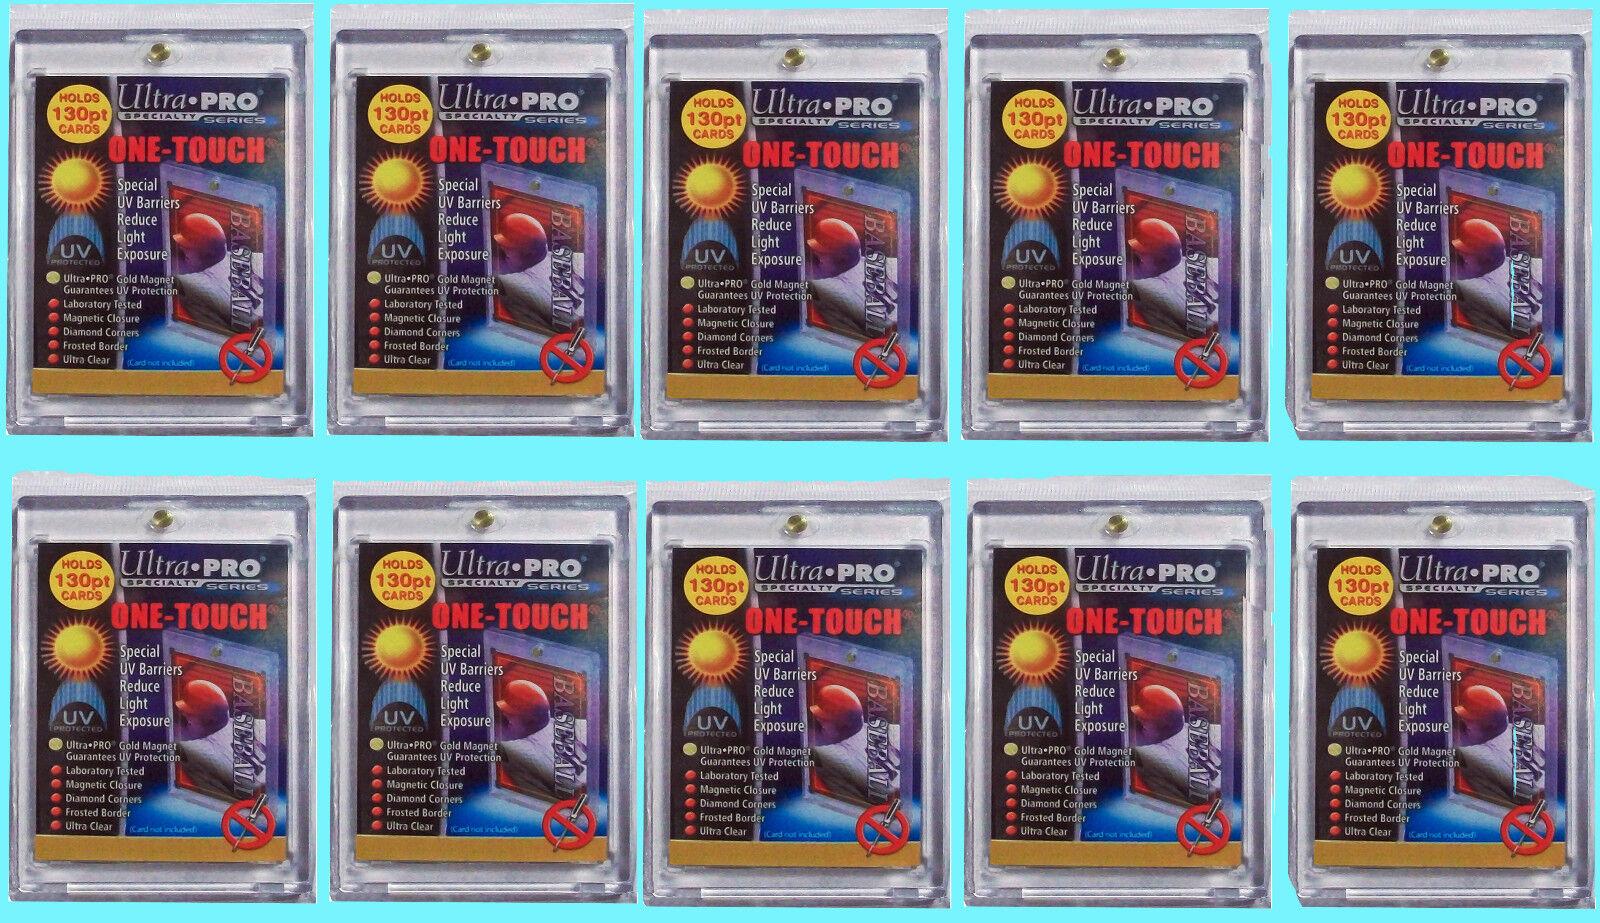 10 Ultra Pro One Touch Magnético 130pt Uv titular de tarjeta Vitrina Dos Piezas